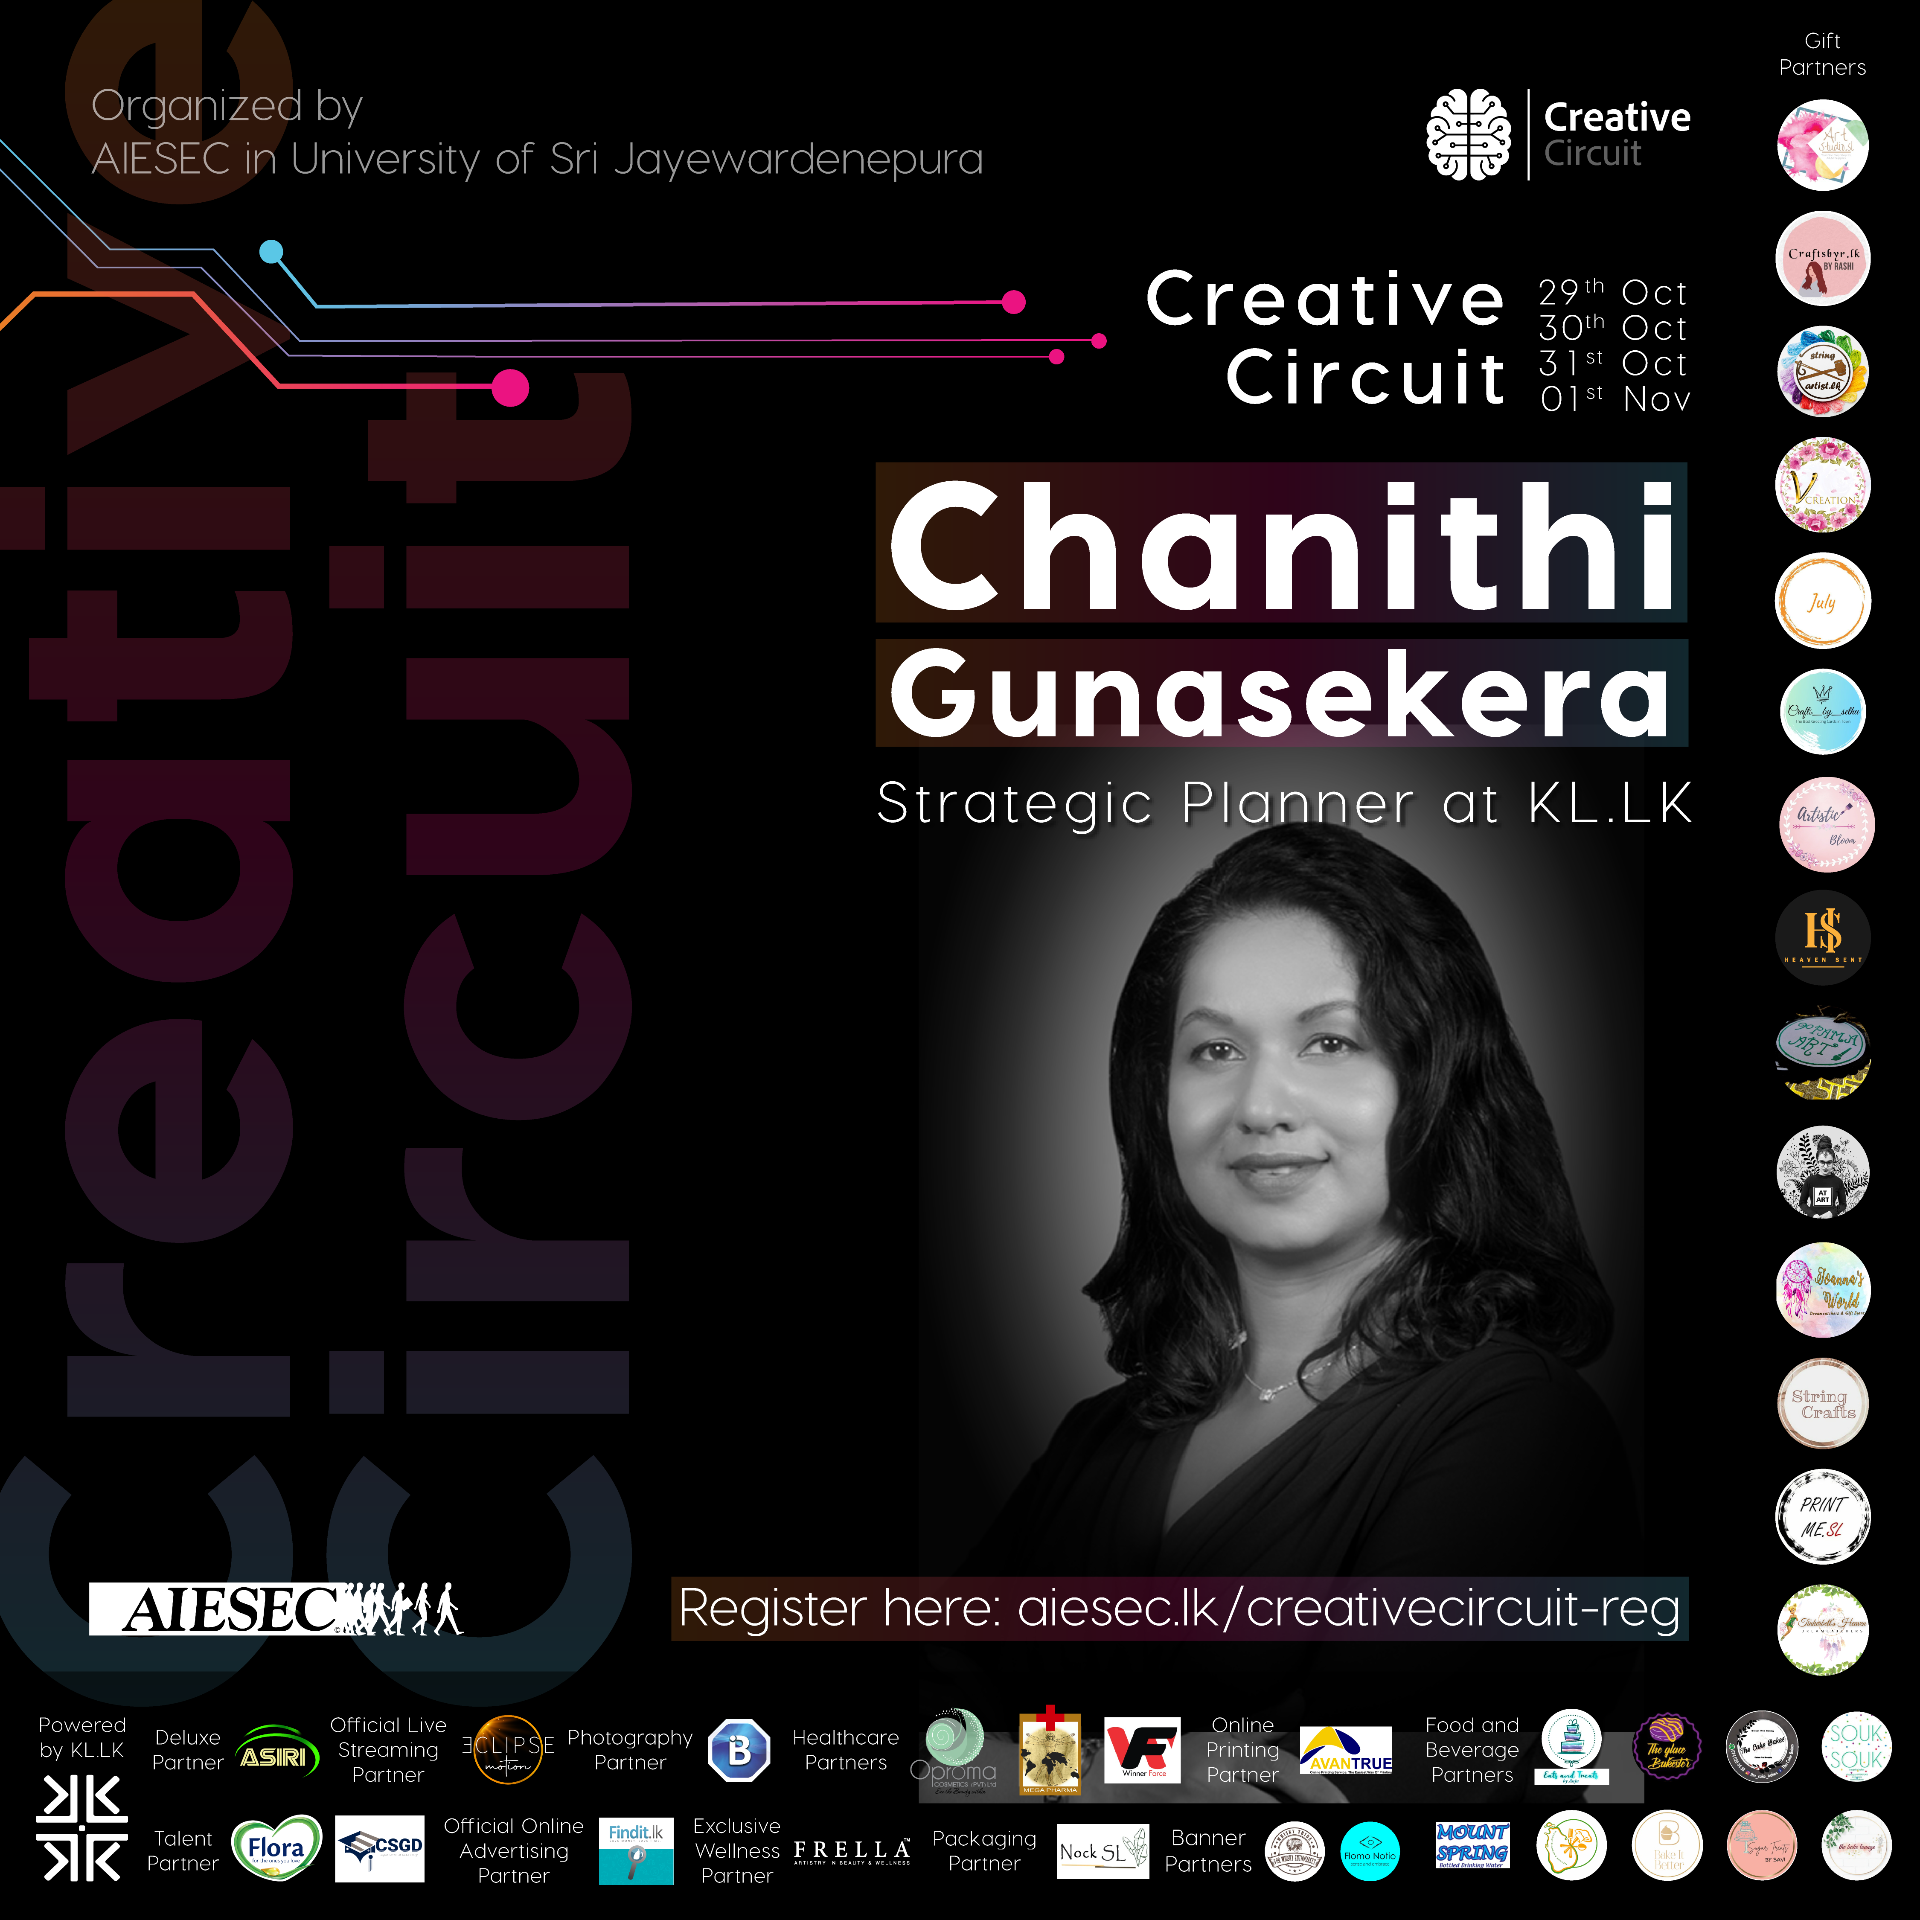 Meet Chanithi Gunasekera  - Strategic Planner at KL.LK